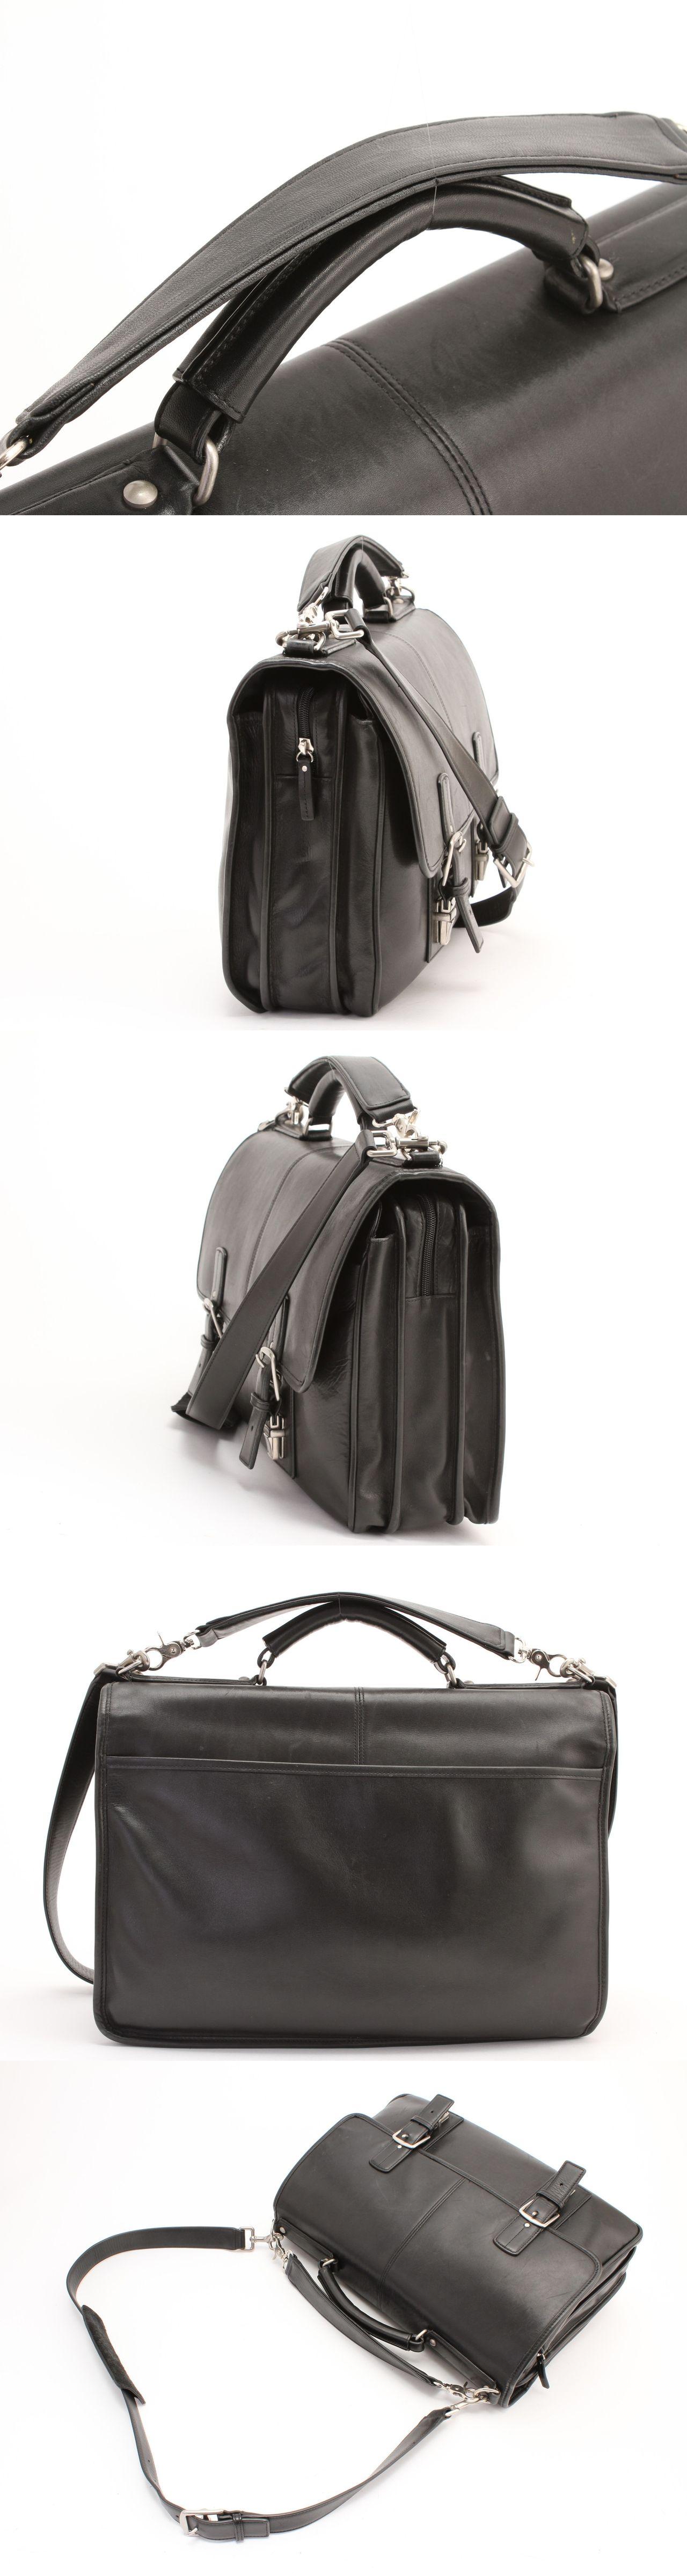 fe7e7f6c00 1 jpy Coach leather briefcase 2way shoulder bag men s business ...